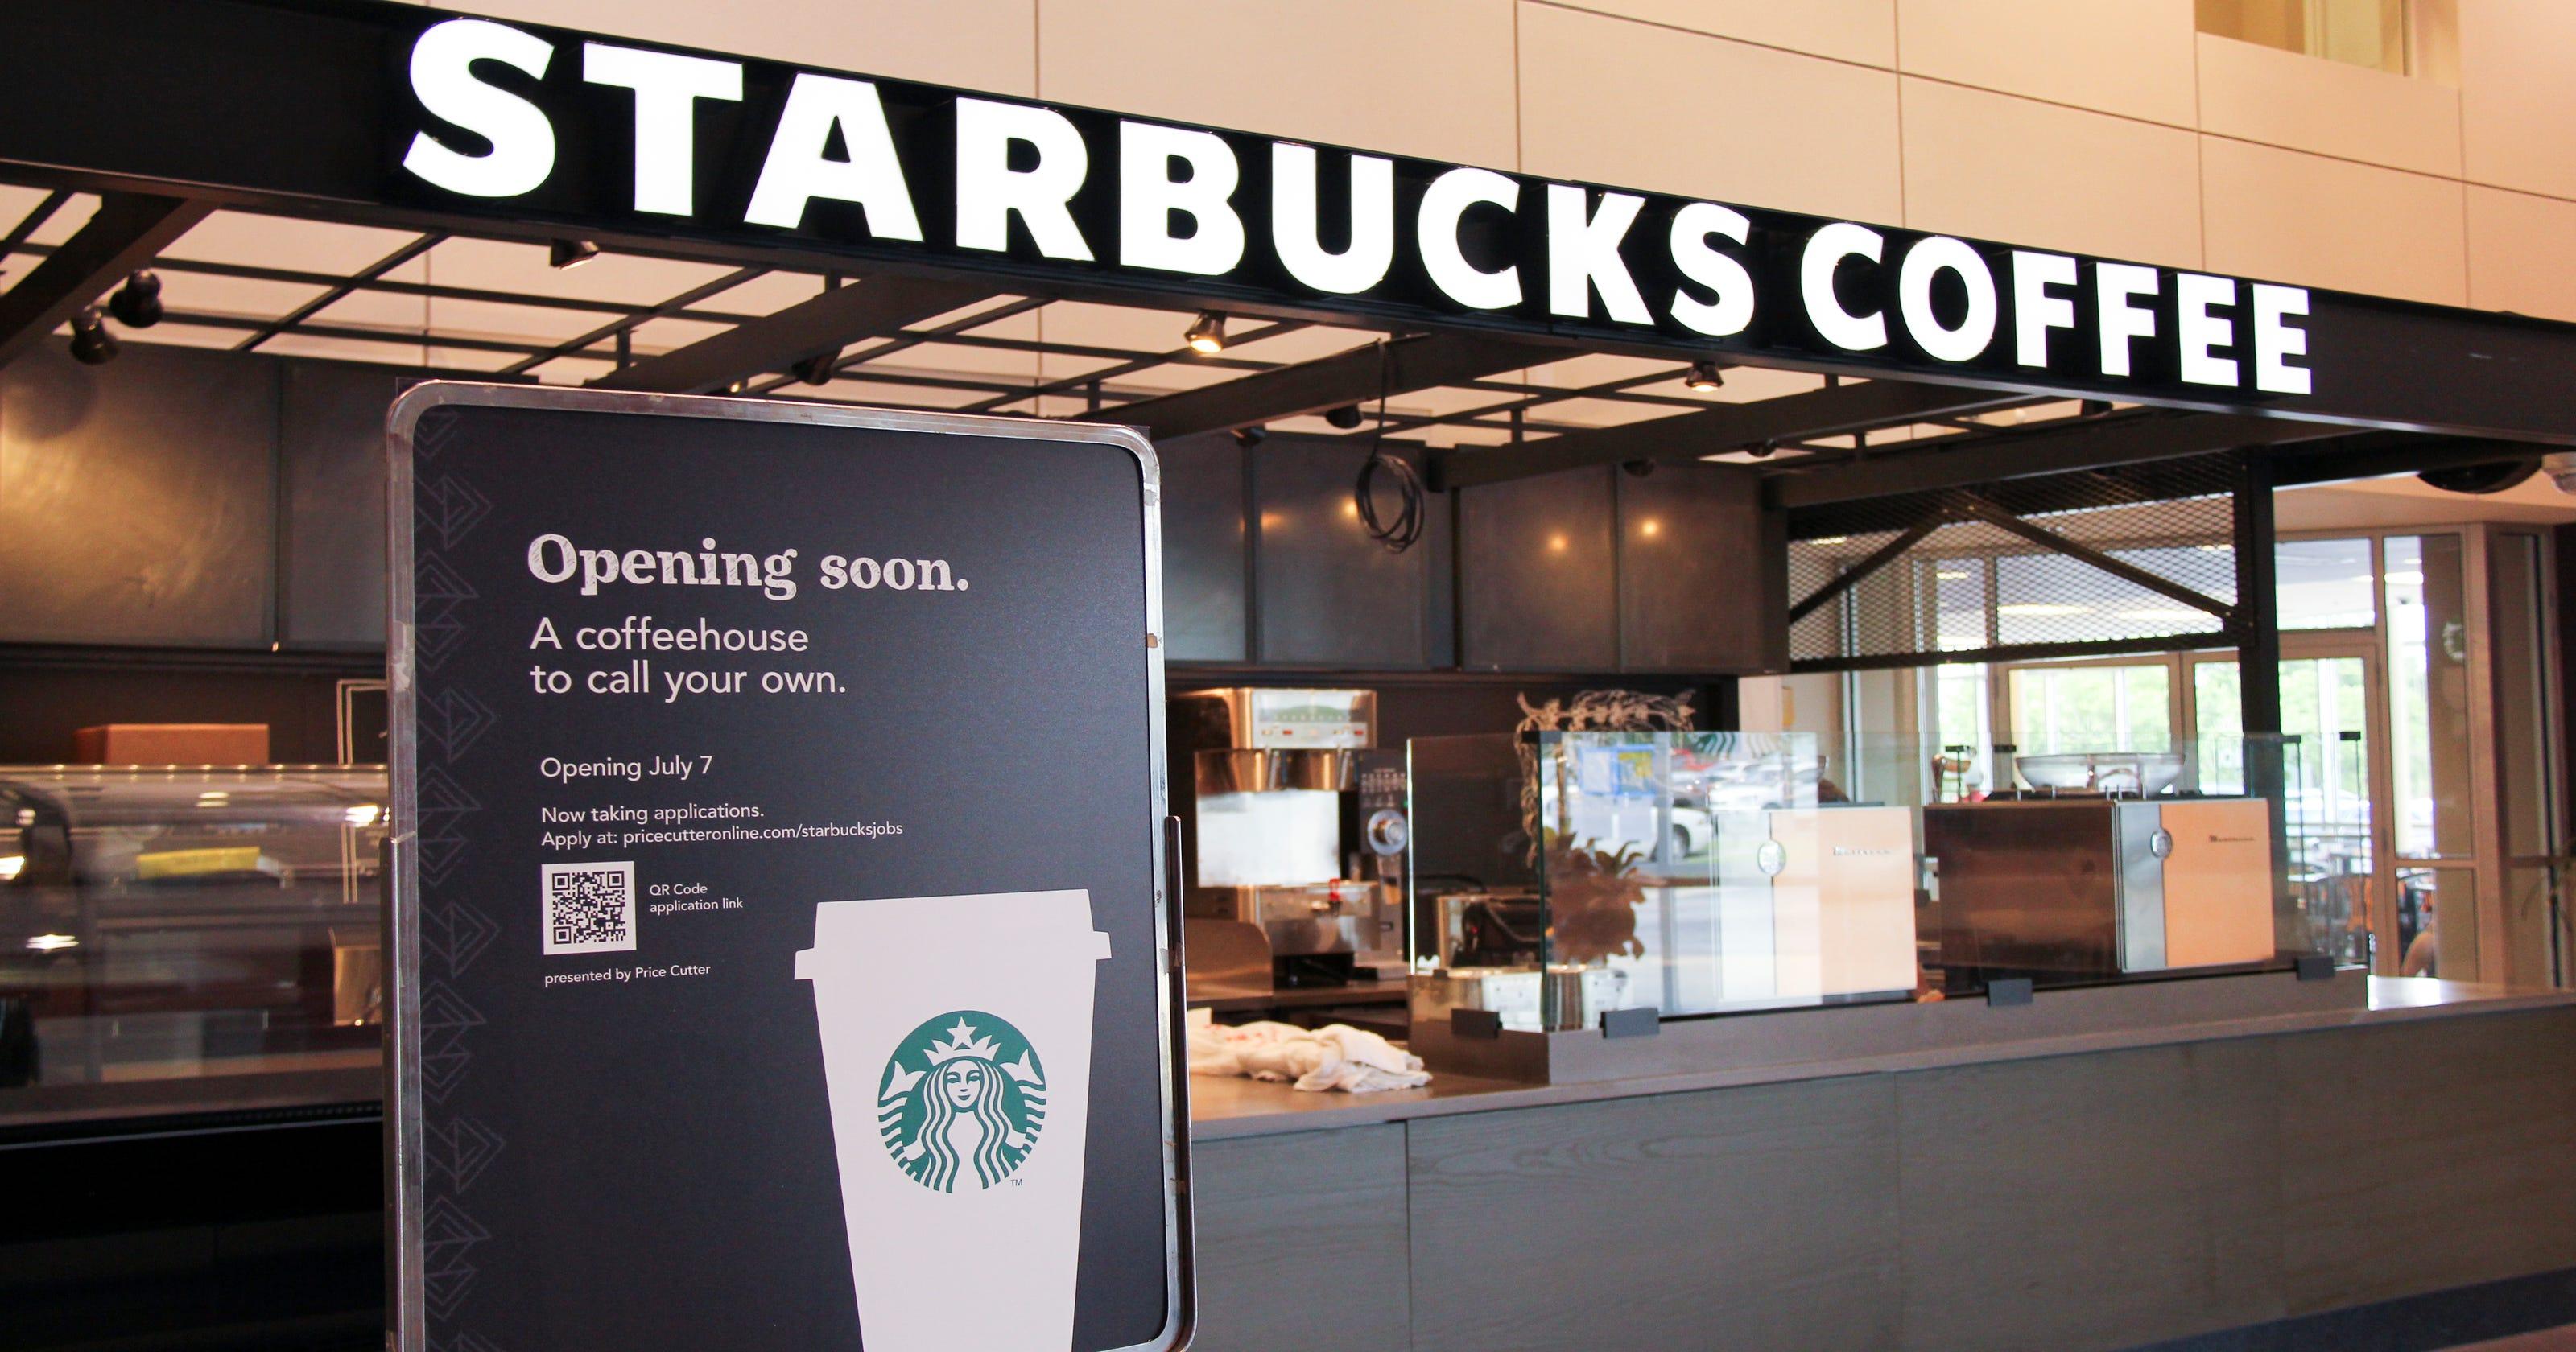 Starbucks kiosk coming to OTC's Springfield campus